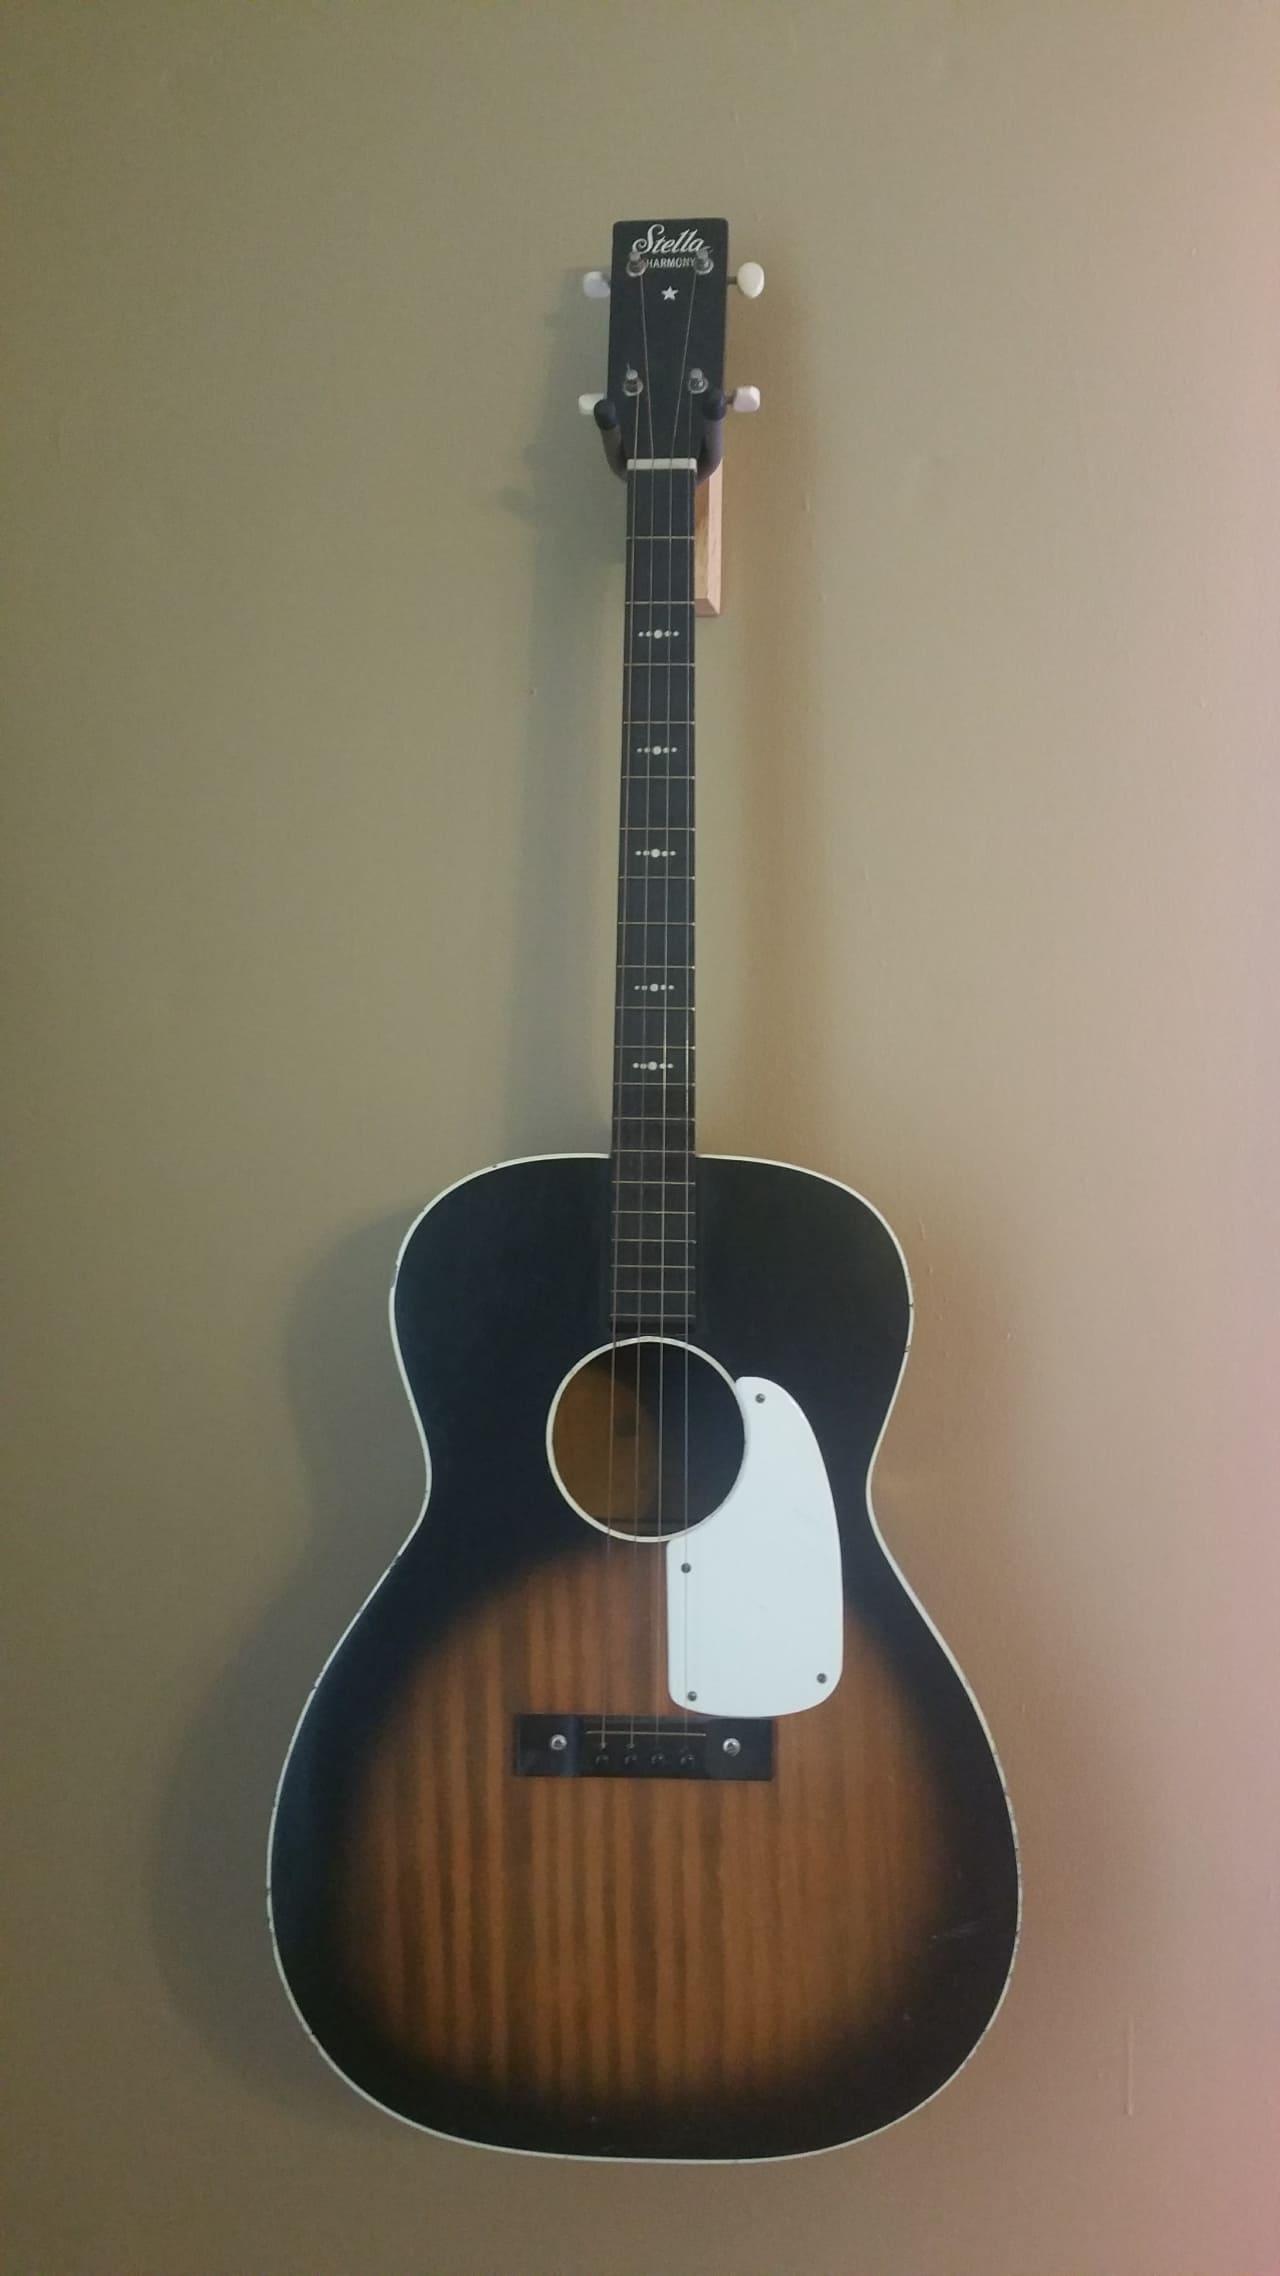 Stella Harmony H929tg Tenor Guitar 1960 S Sunburst Reverb